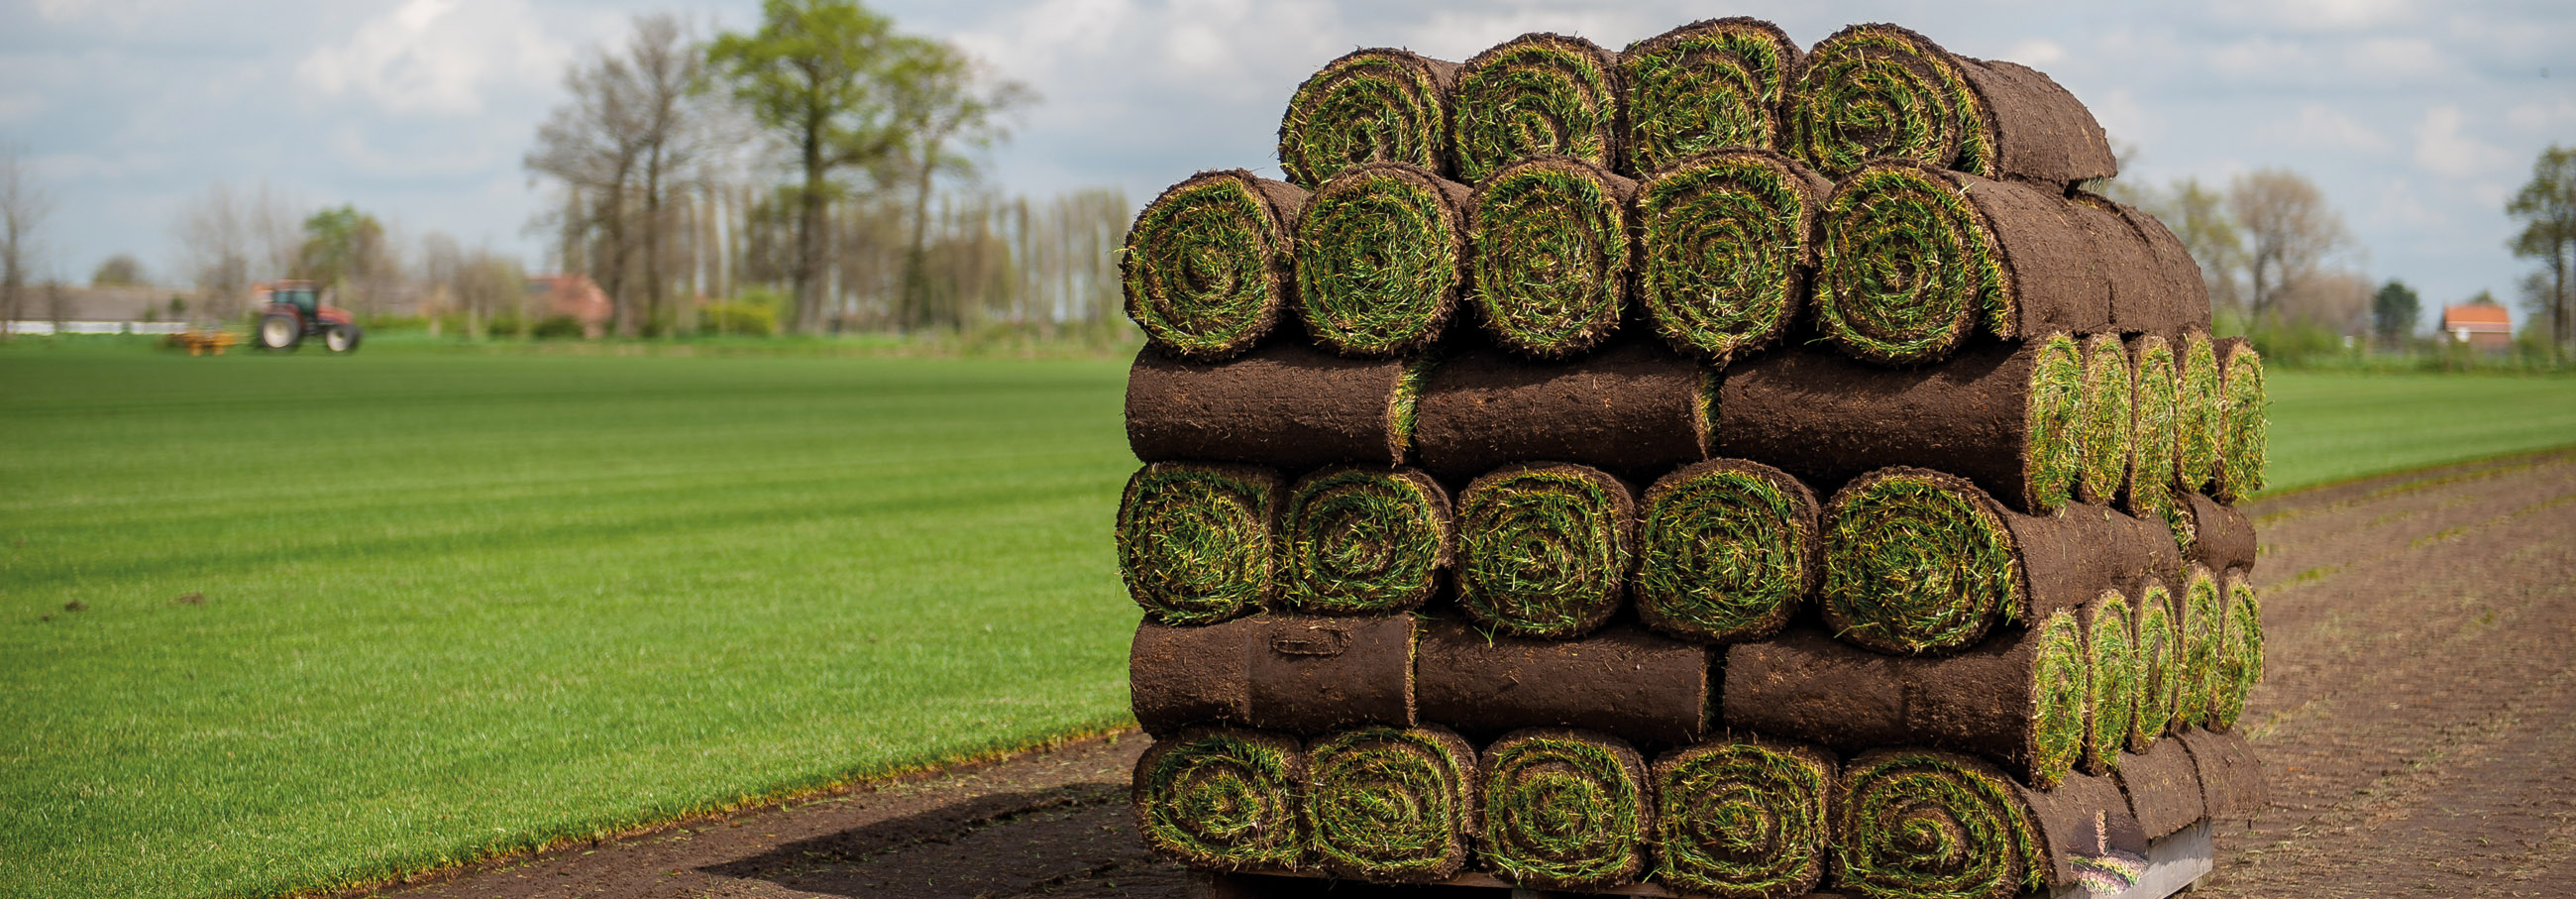 Stapel opgerolde graszoden